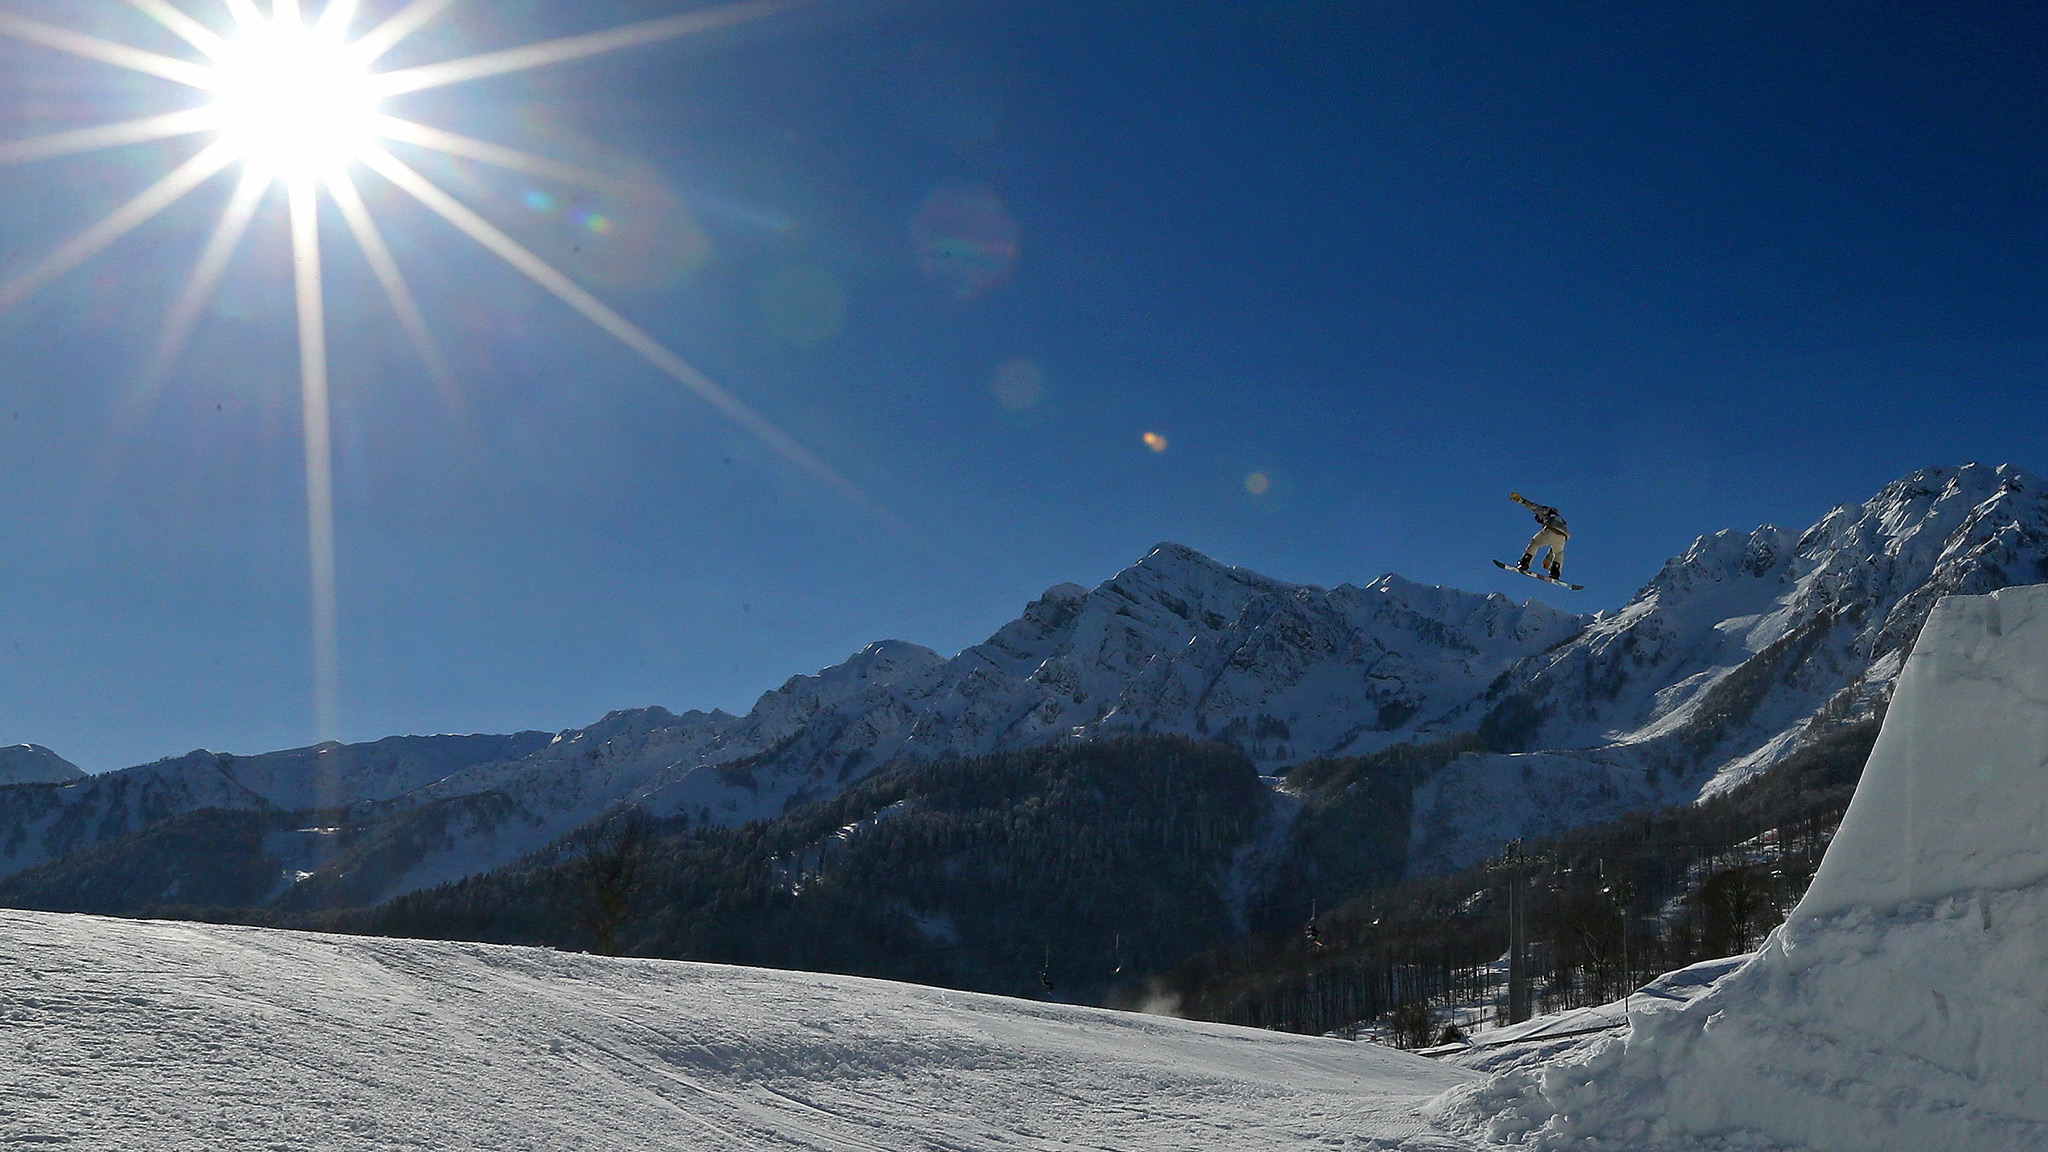 Winter Olympics, 2014